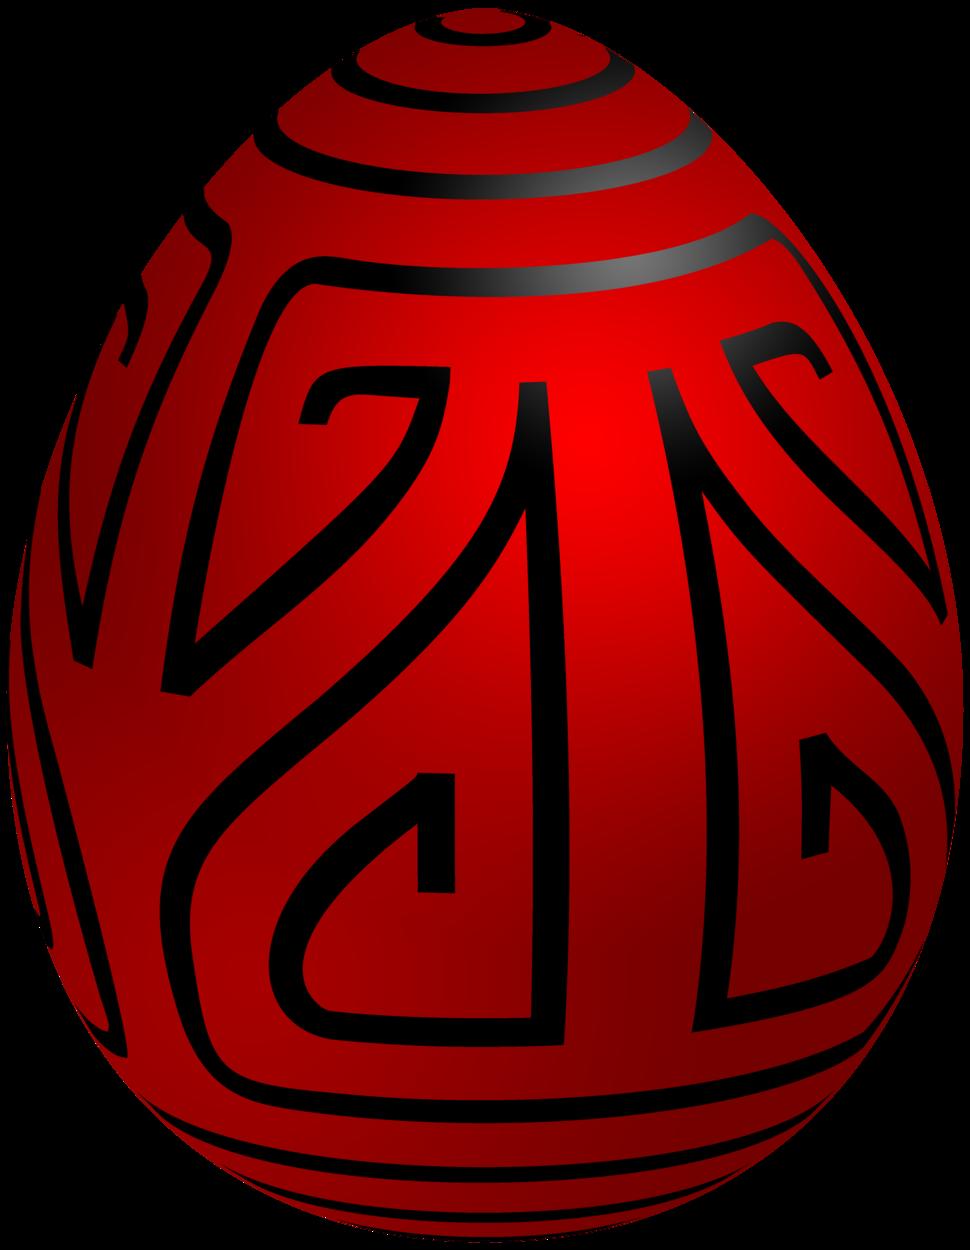 Easter Red Deco Egg PNG Clip Art